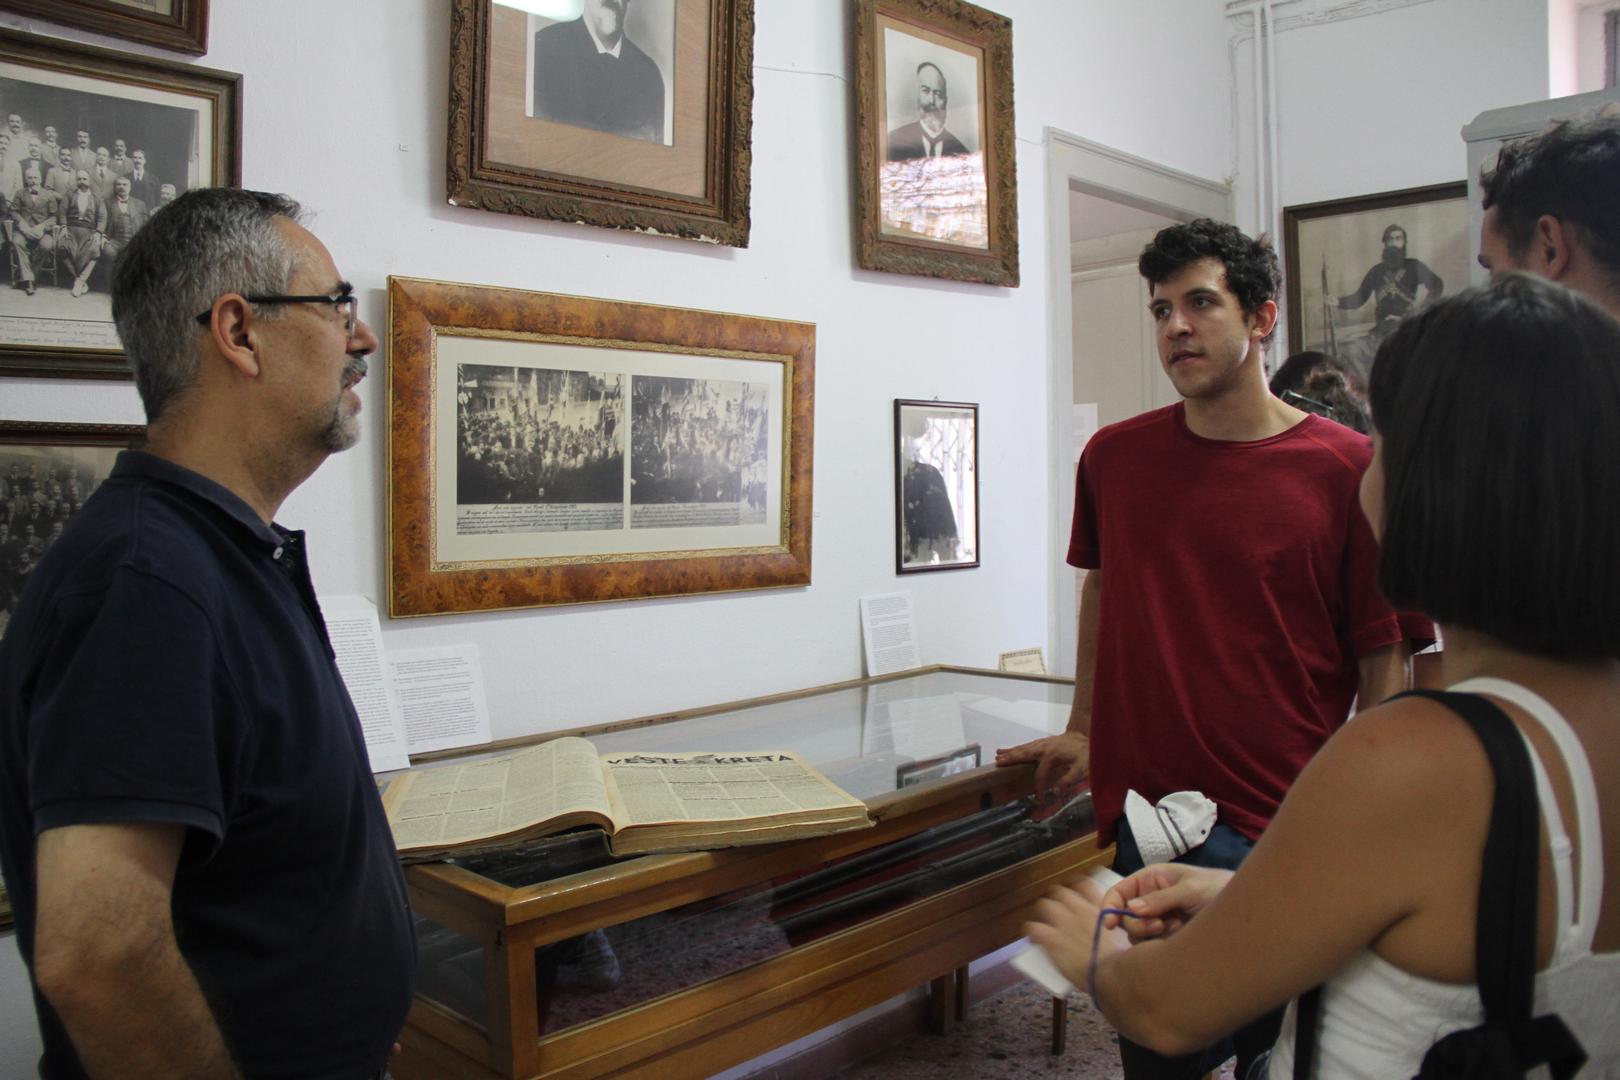 Historisches Archiv Kreta in Chania; Fotonachweis Archiv VgK e.V.